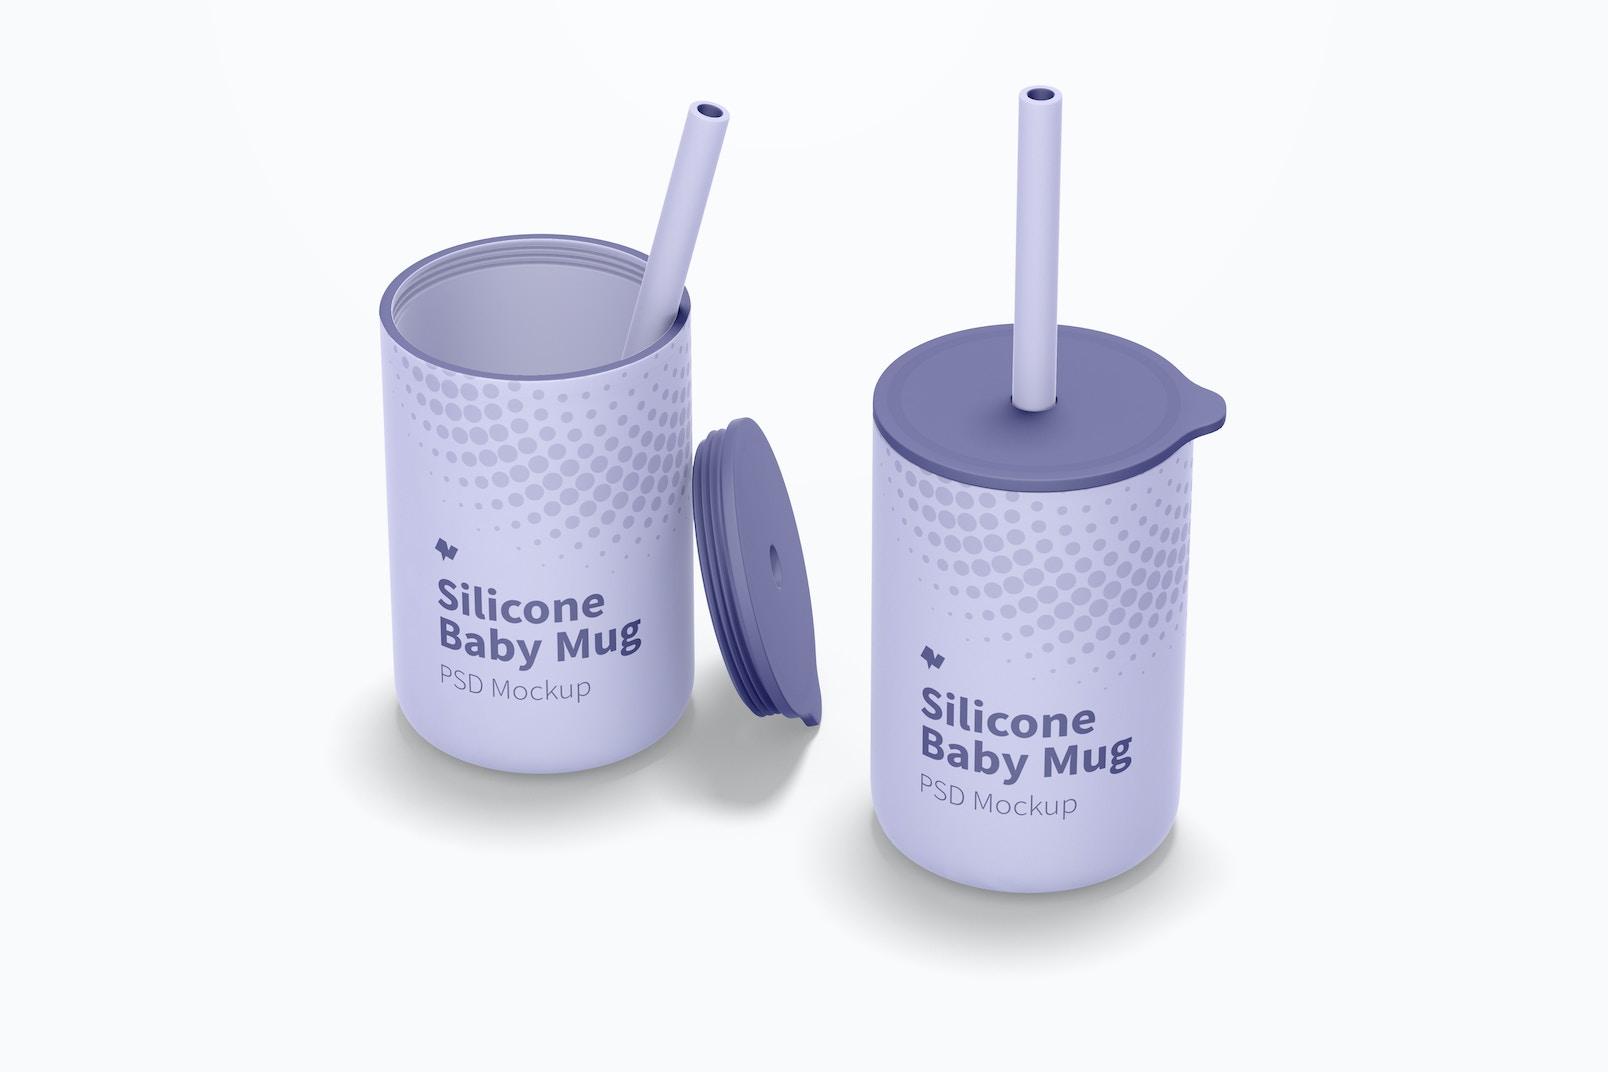 Silicone Baby Mugs with Lid Mockup